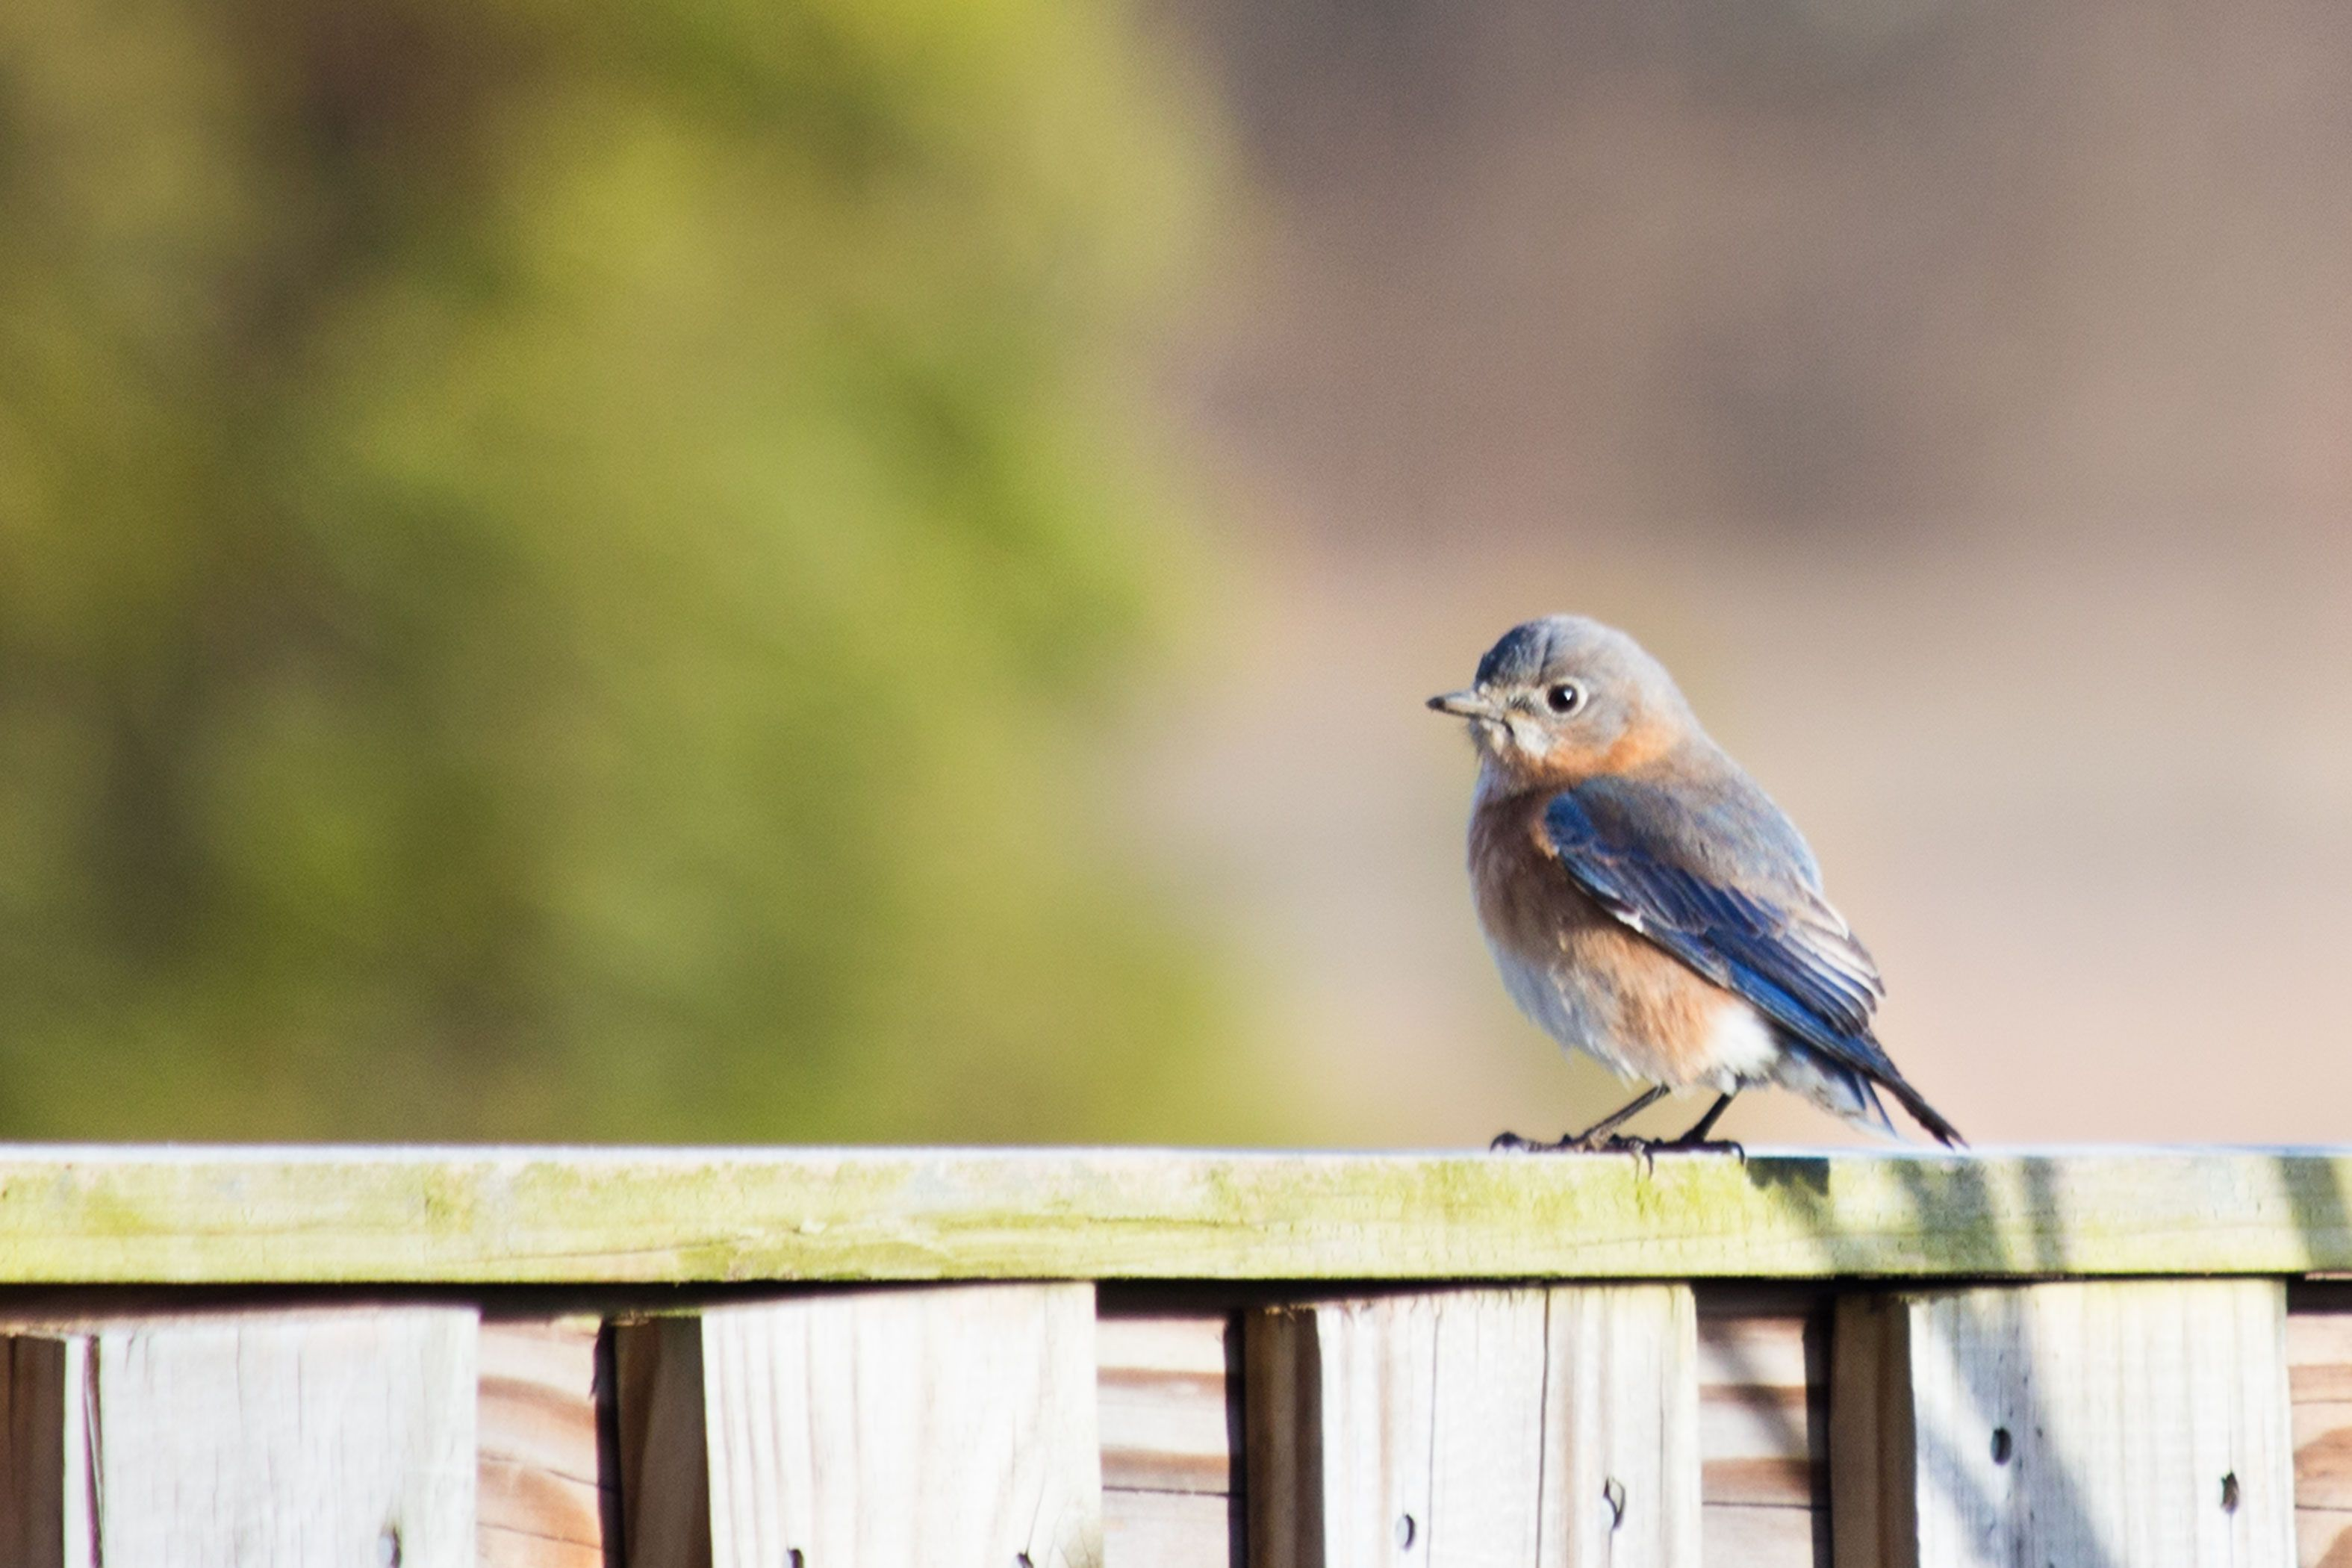 How To Get Rid Of Birds Near Your Home Birds, Keep birds